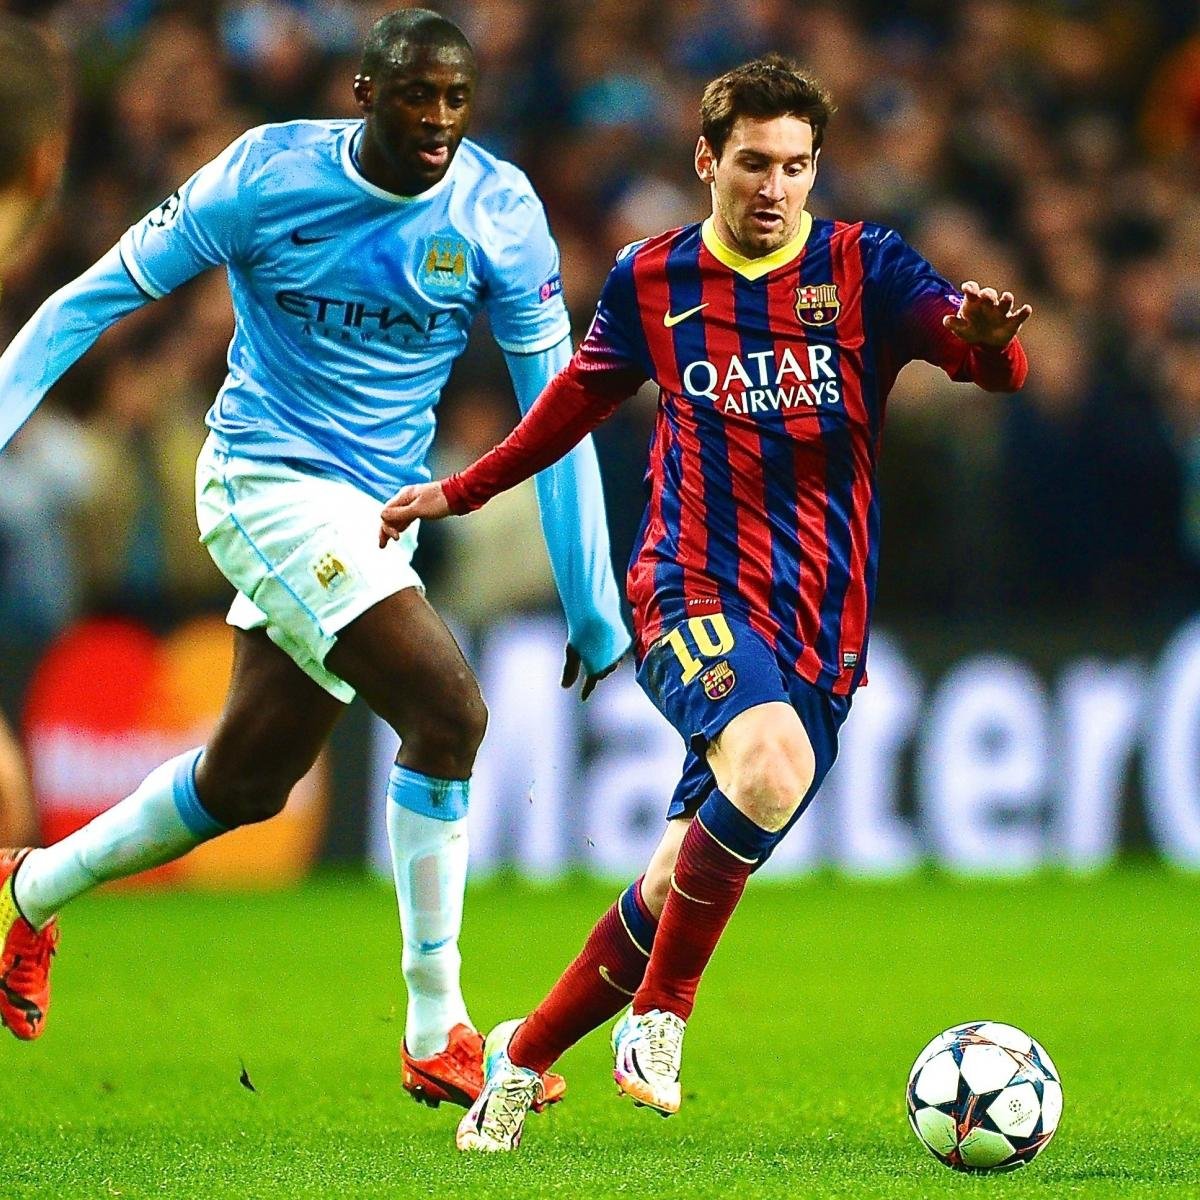 Psg Vs Manchester City Live Score Highlights From: Barcelona Vs. Manchester City: Champions League Live Score